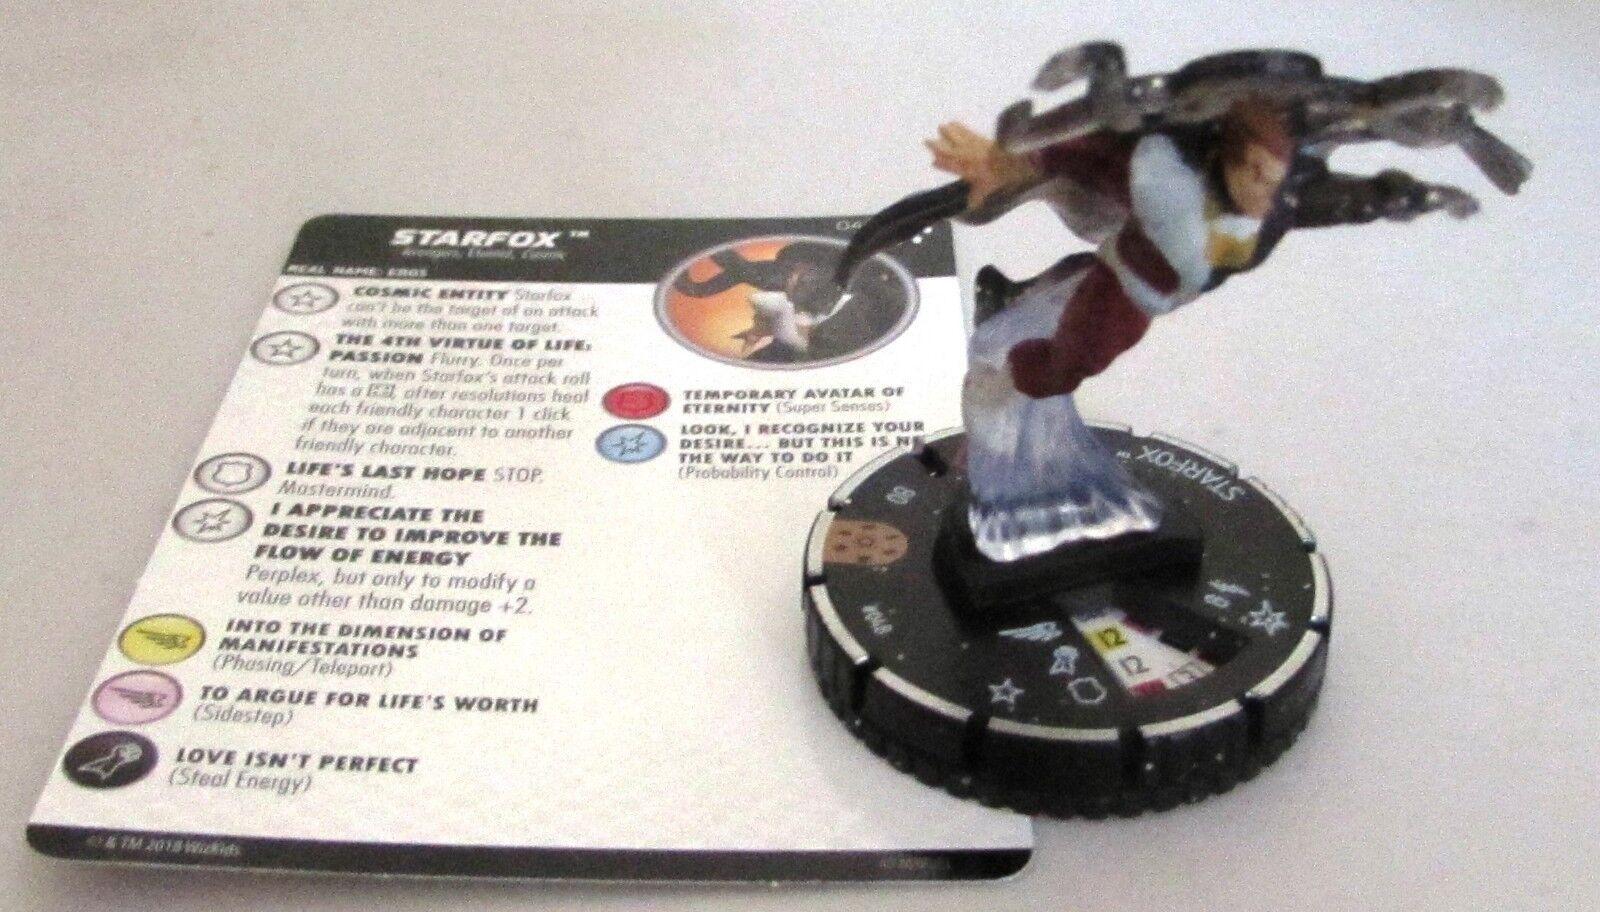 Estrellafox 048 Avengers Infinity Marvel Heroclix  Chase Rare  memorizzare